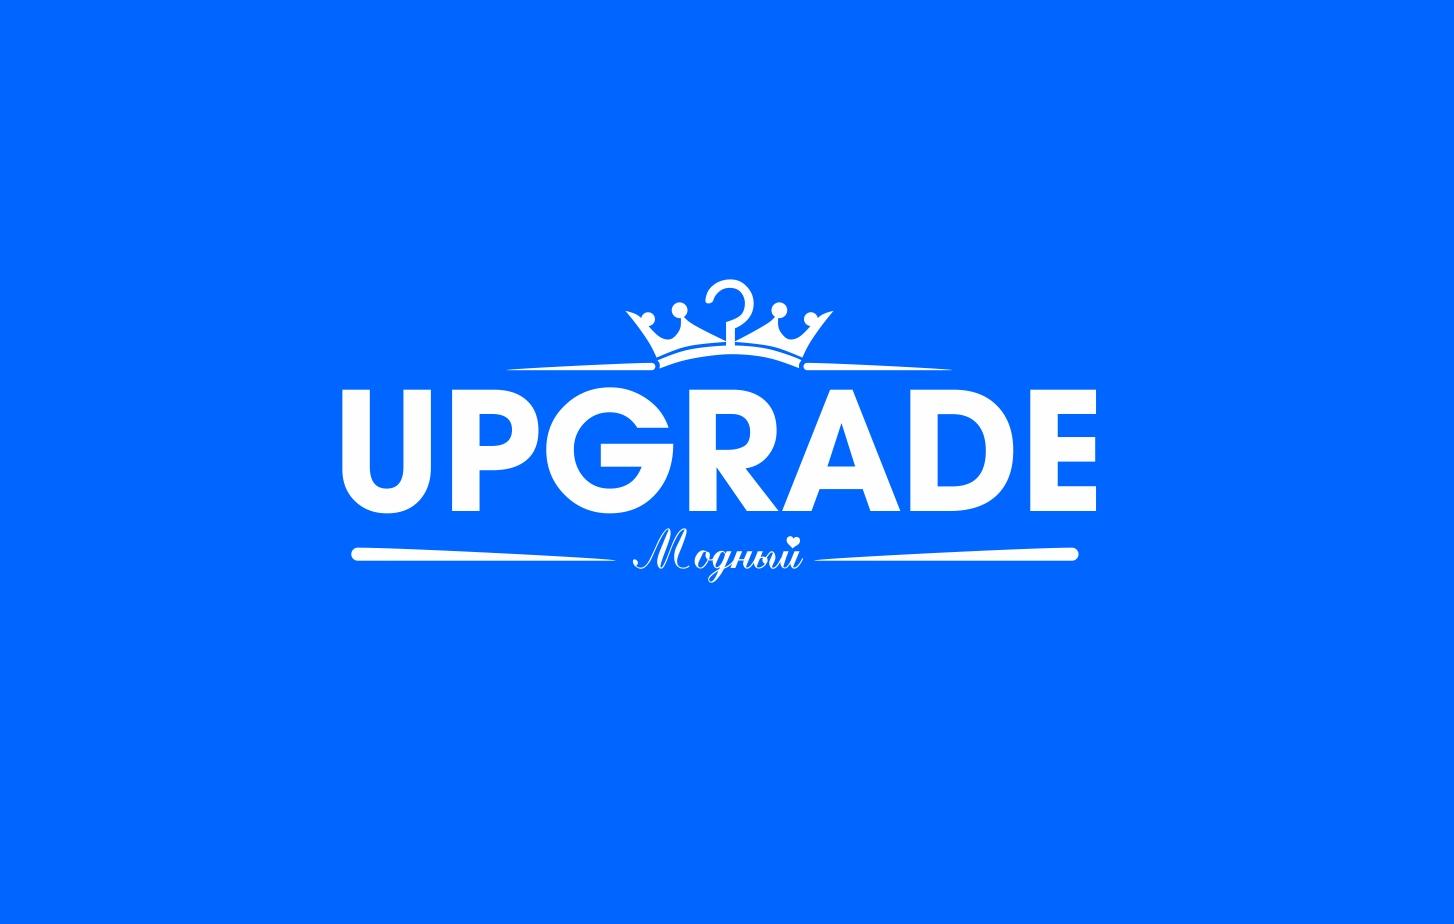 "Логотип интернет магазина ""Модный UPGRADE"" фото f_70959483f167d7c1.jpg"